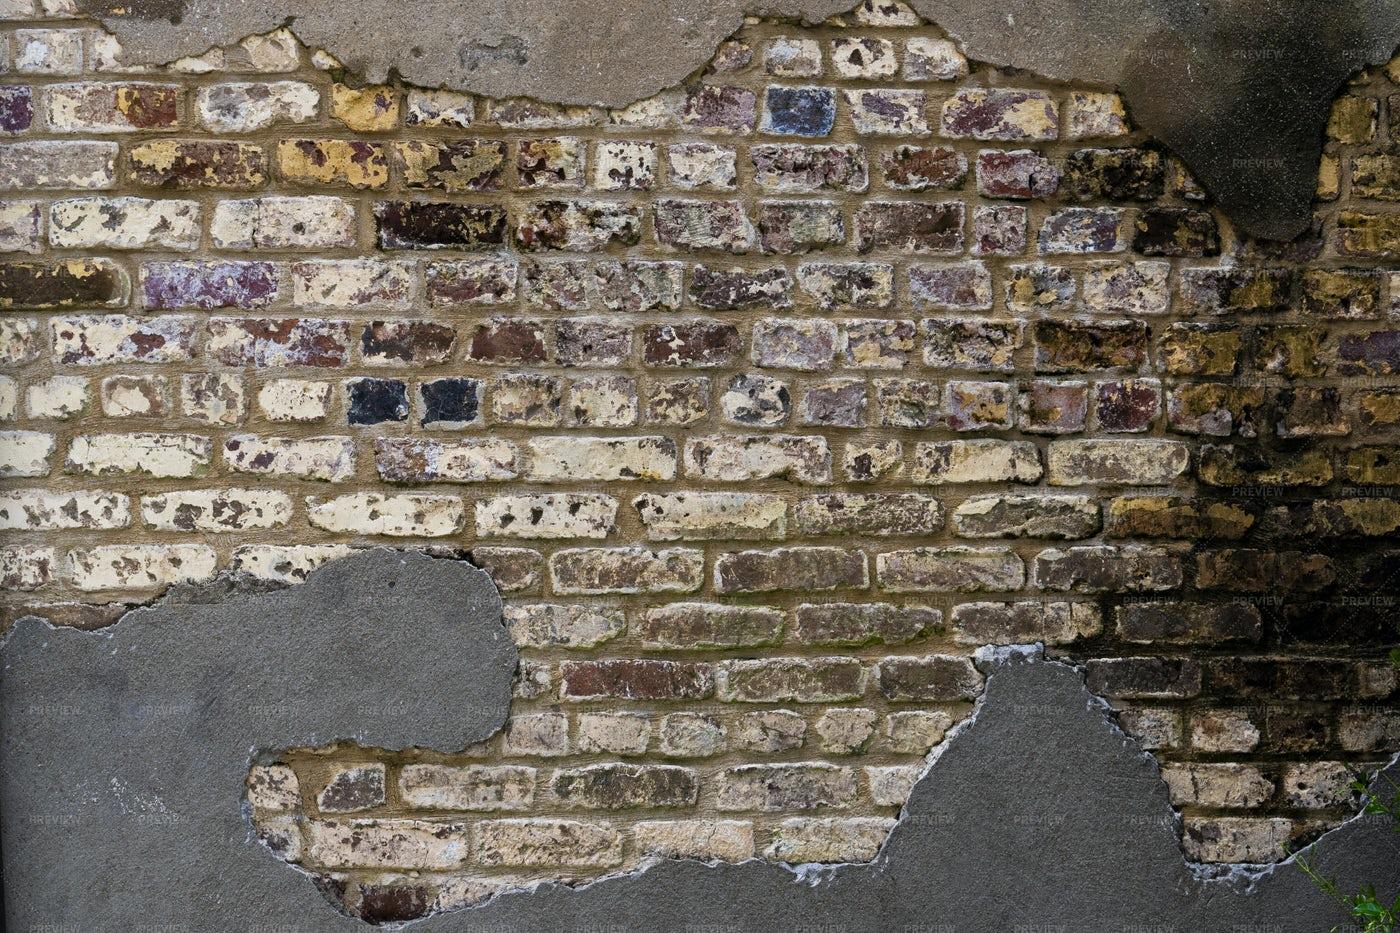 Brick Wall With Mold: Stock Photos